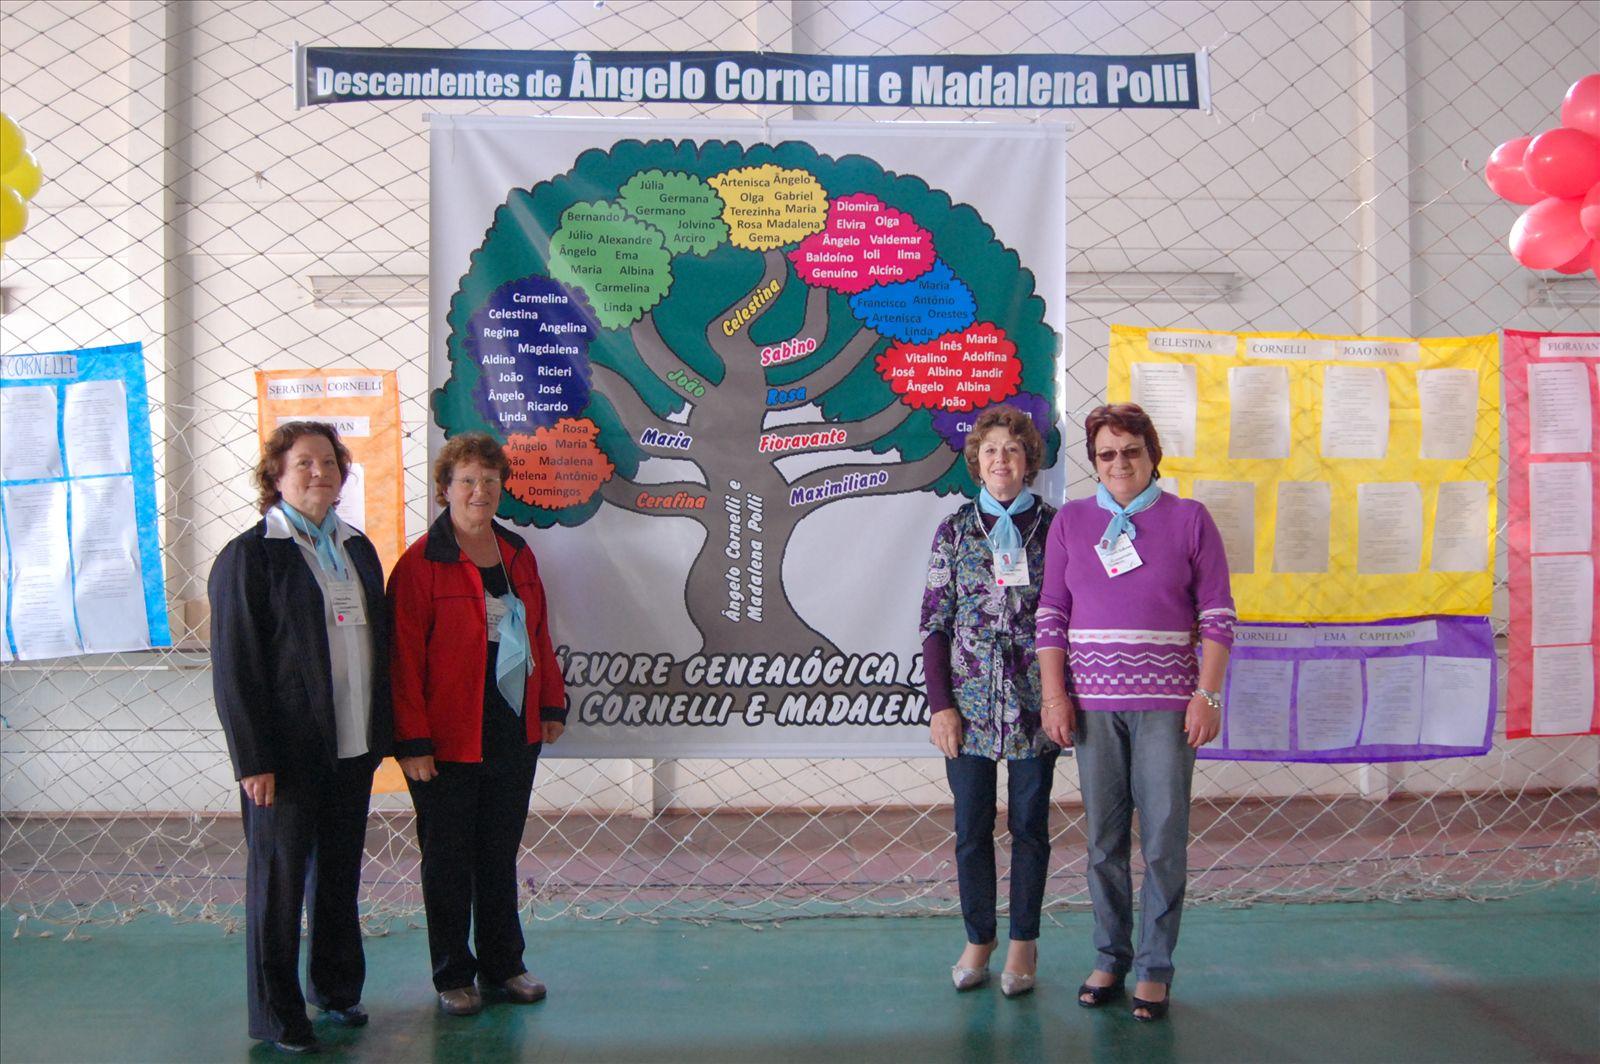 2º Encontro Família Cornelli - 11.10.2009 (18)_0